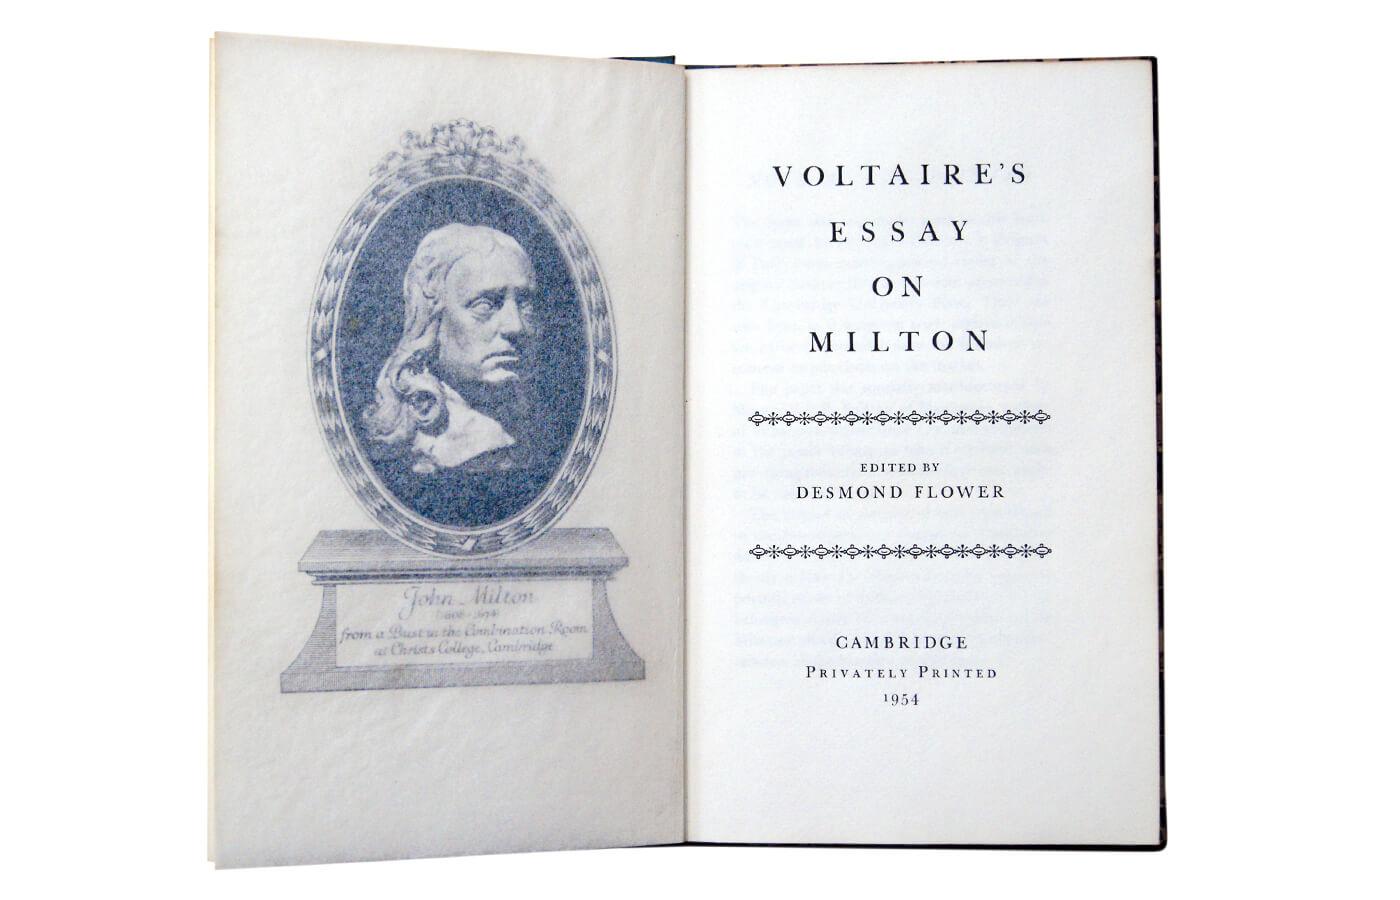 Voltaire's Essay on Milton